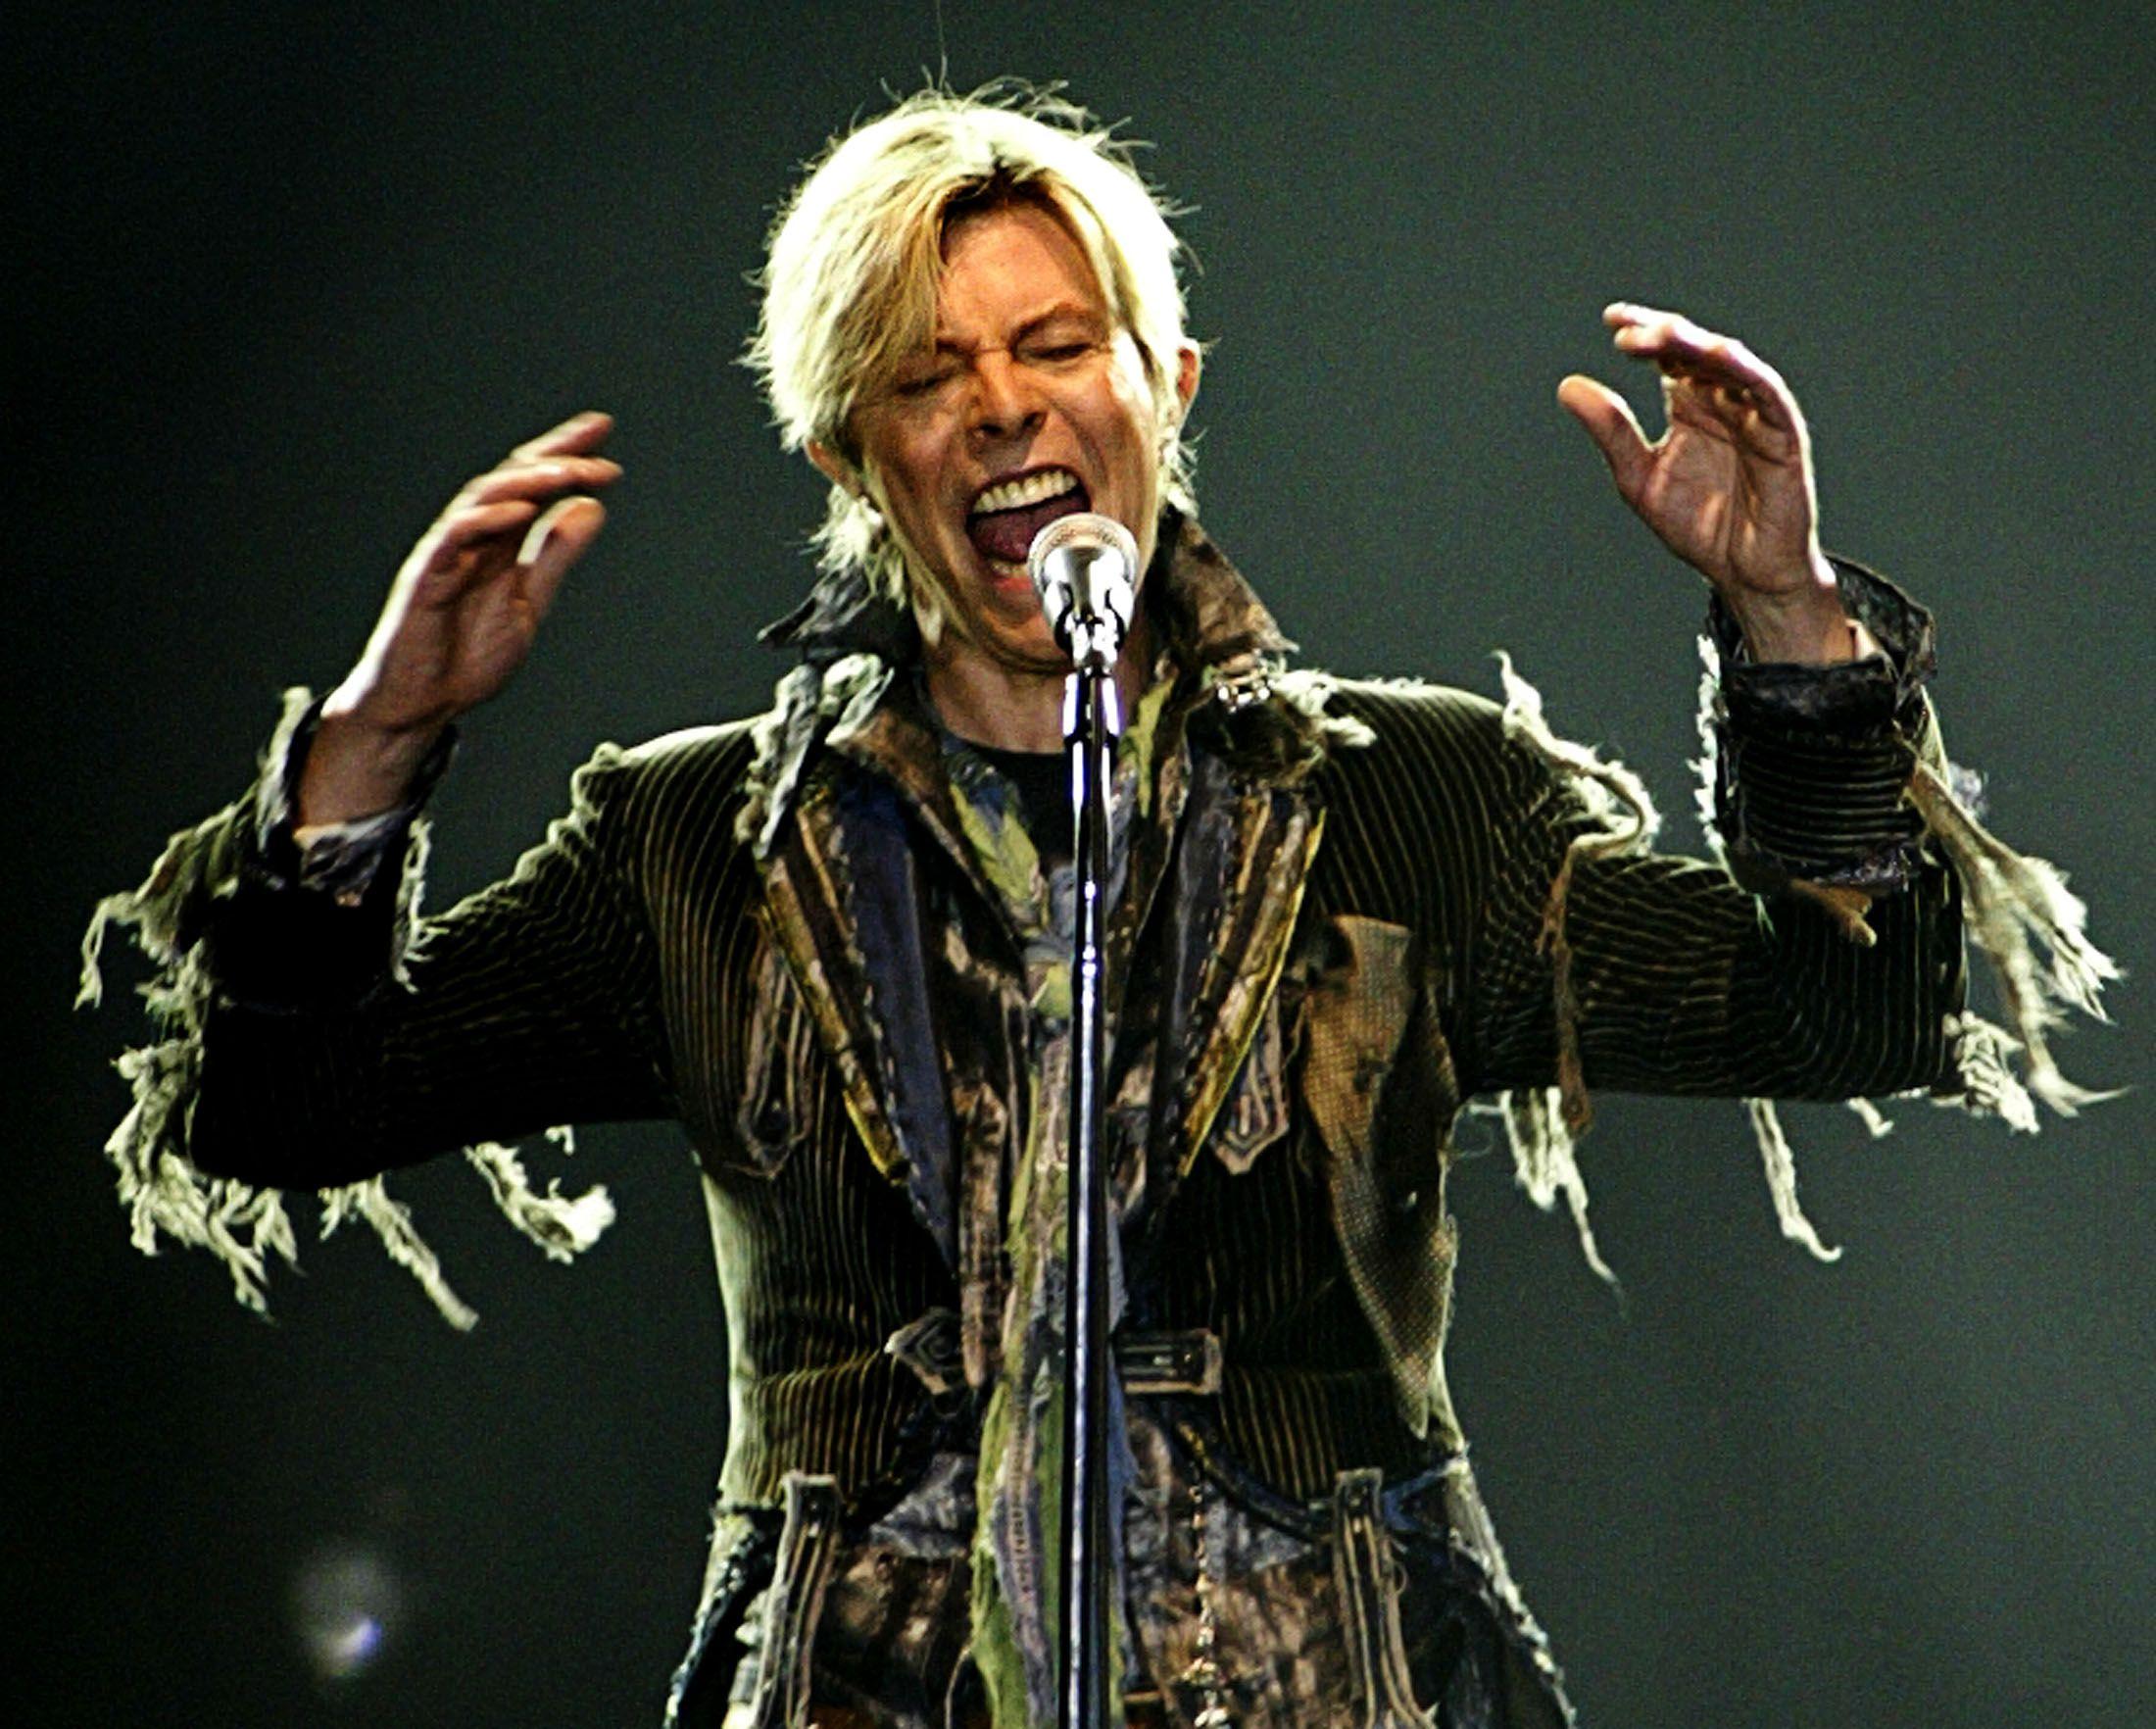 David_Bowie_2003